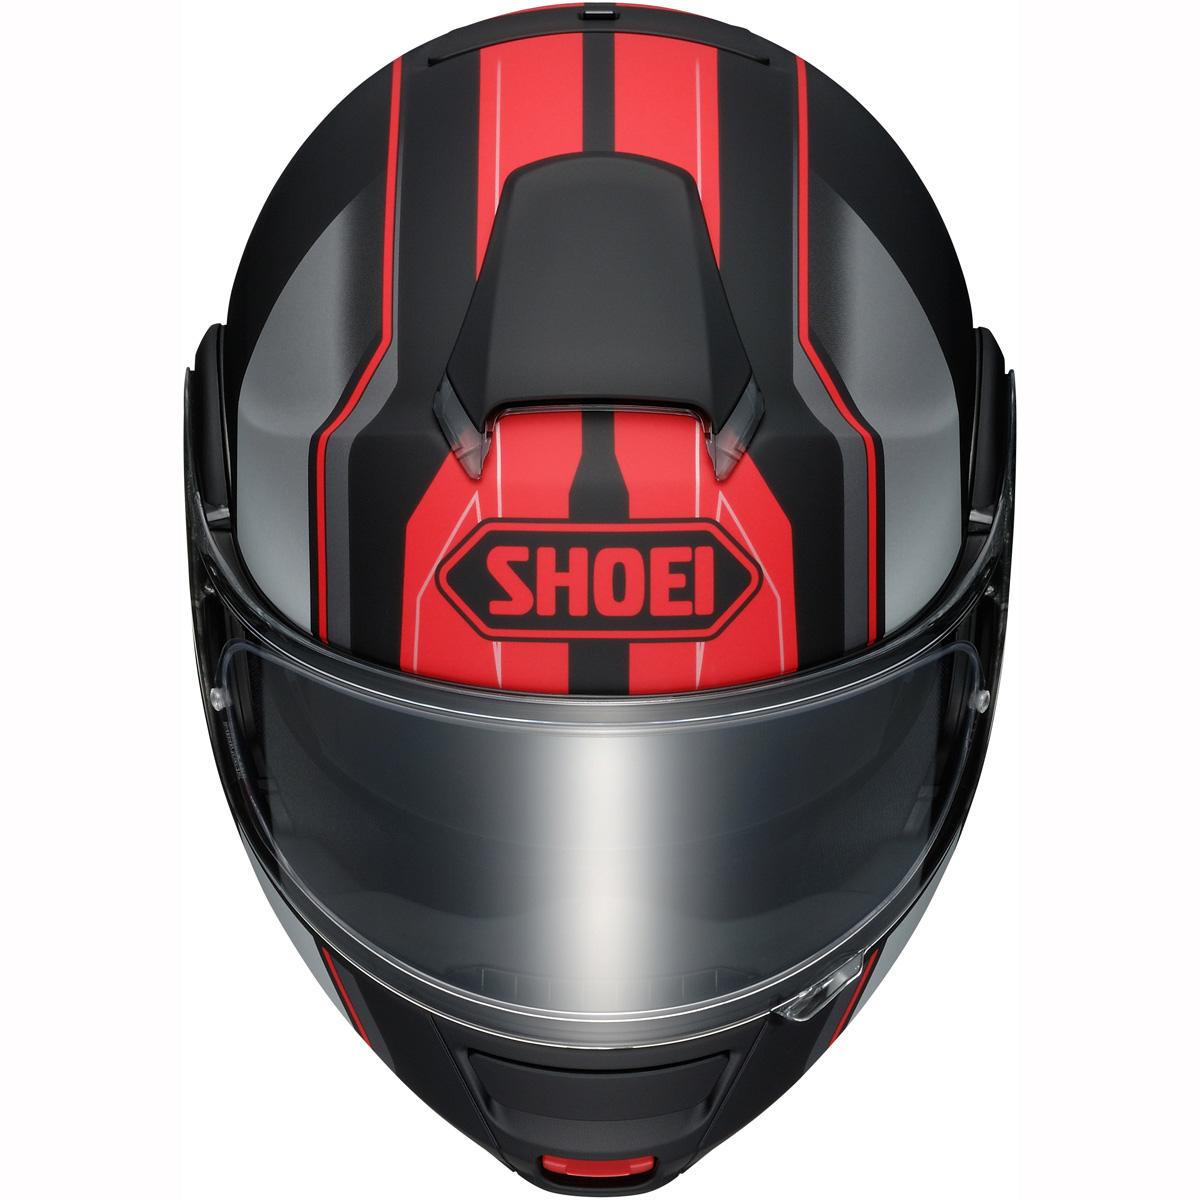 Capacete Shoei Neotec Imminent TC-1 ( Escamoteável ) NOVO!  - Super Bike - Loja Oficial Alpinestars